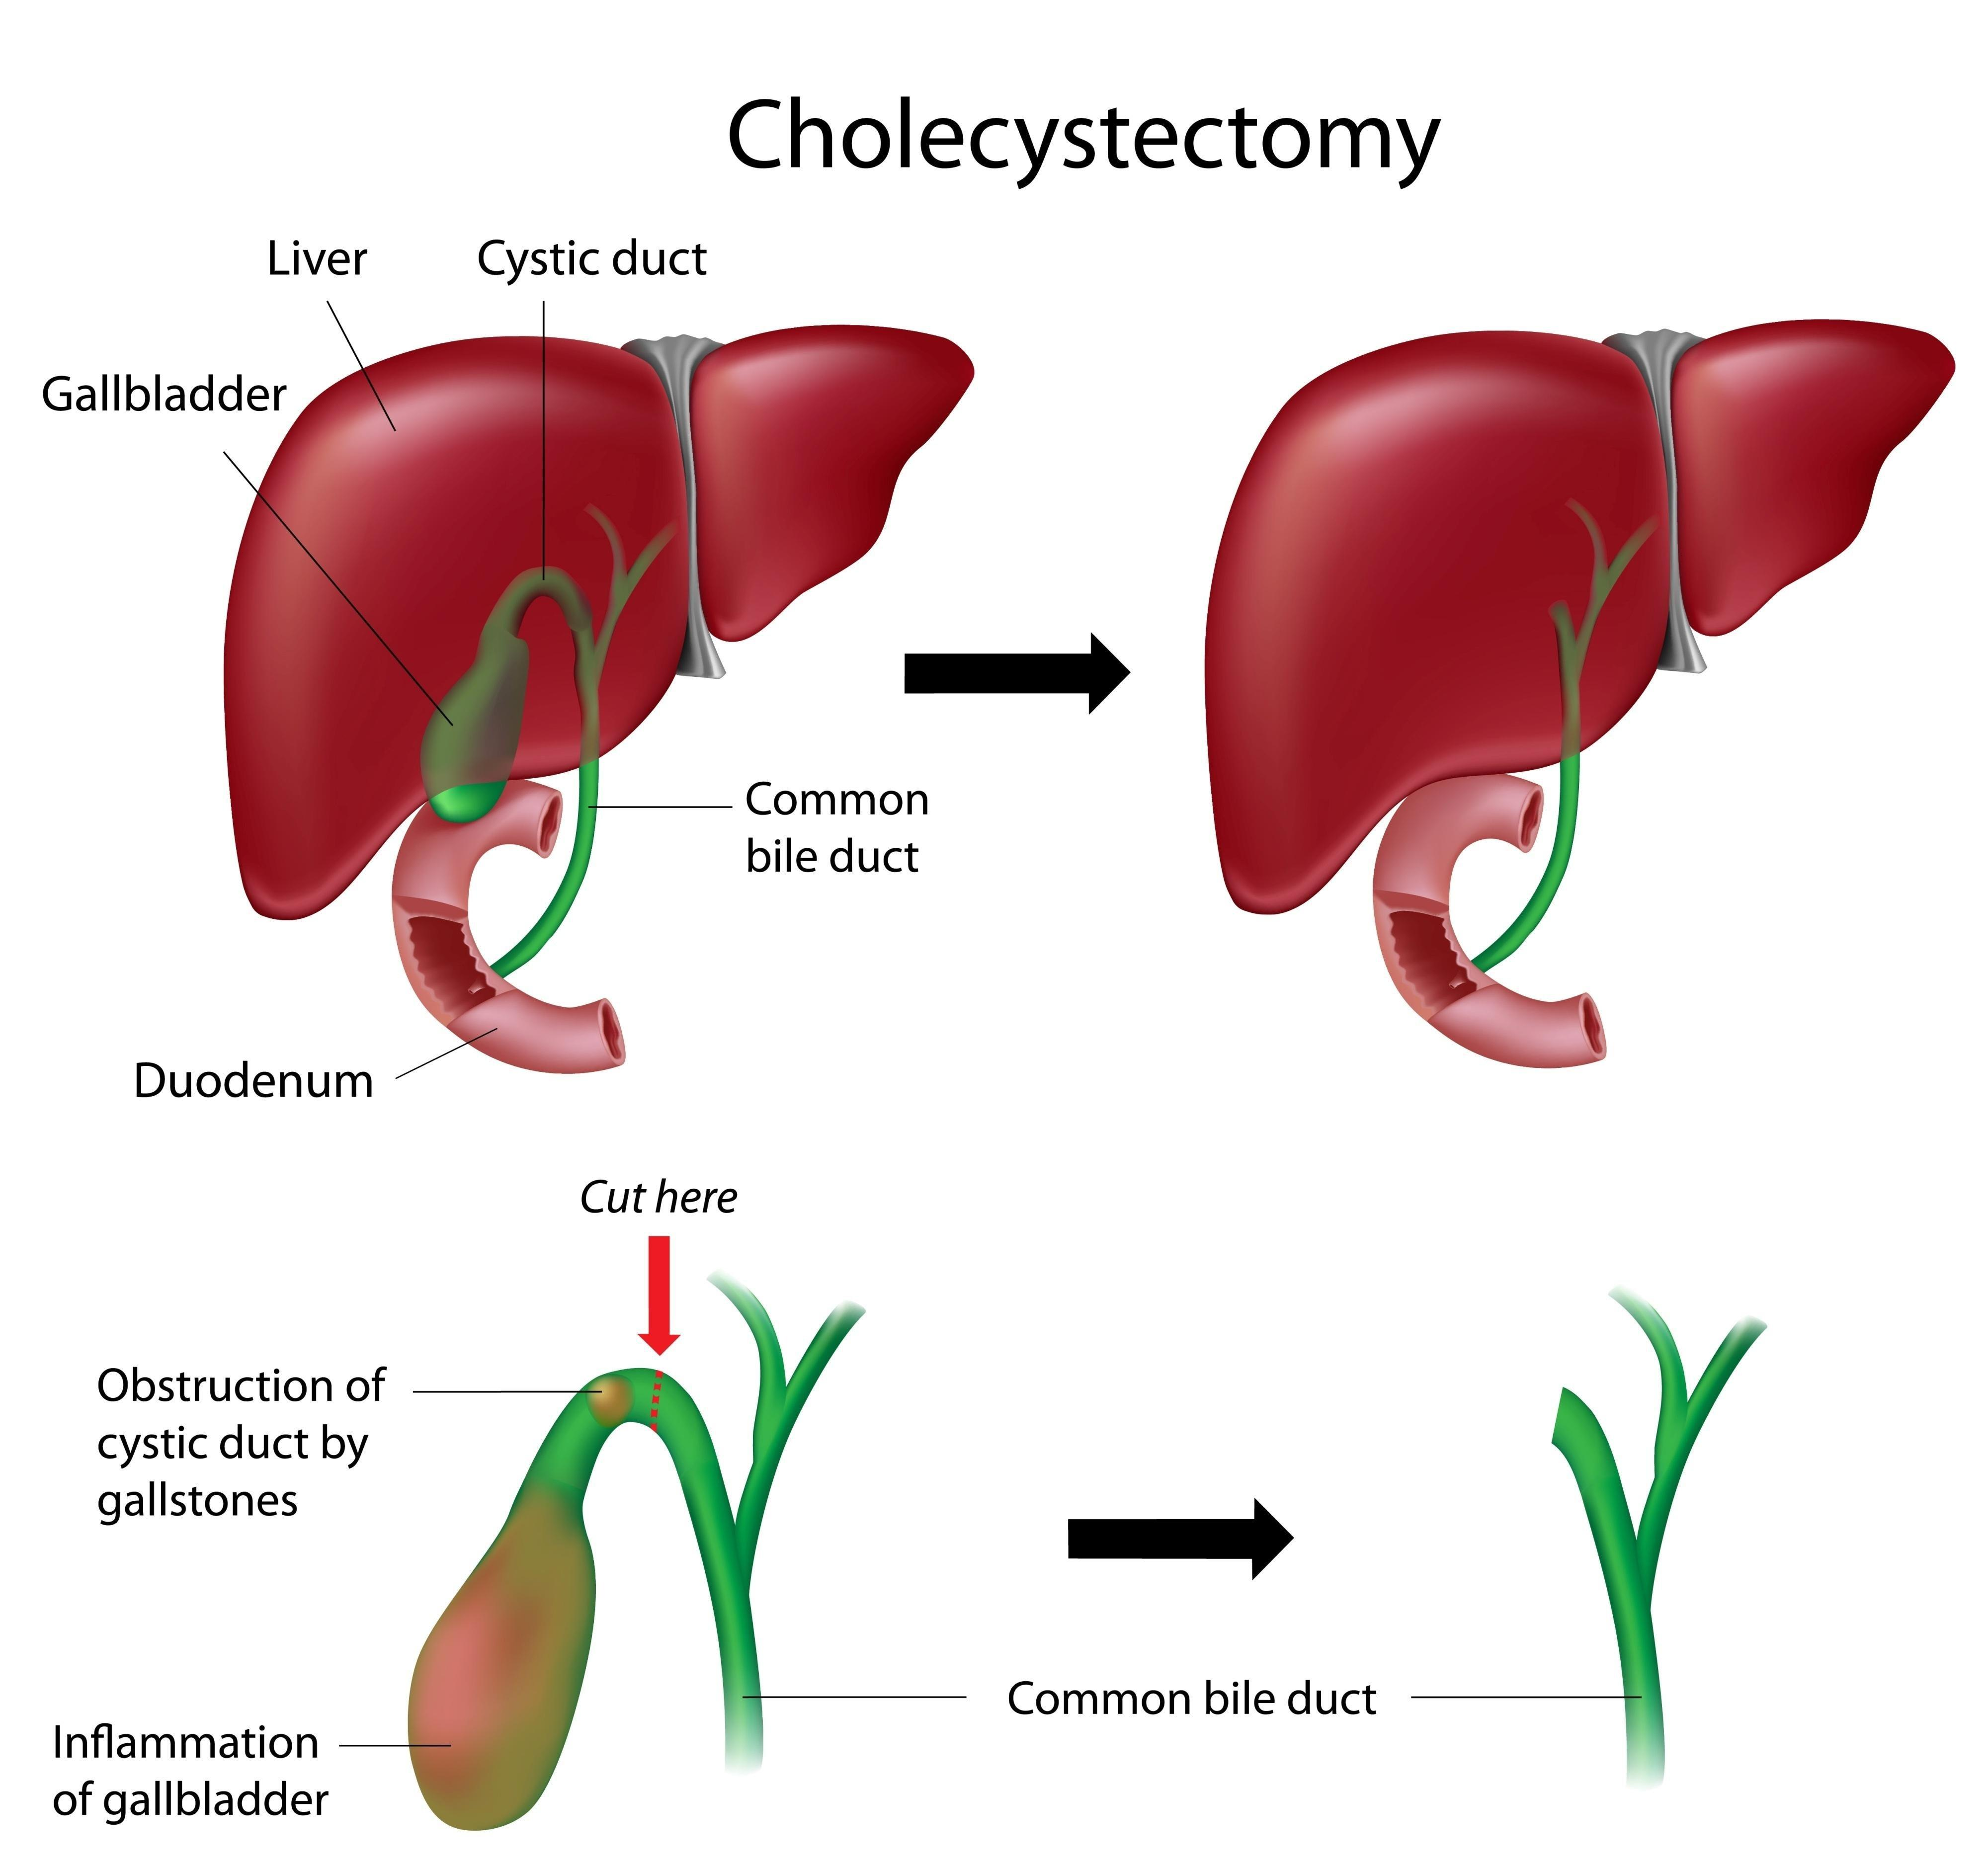 Gallbladder Removal By Laparoscopy (laparoscopic Cholecystectomy)